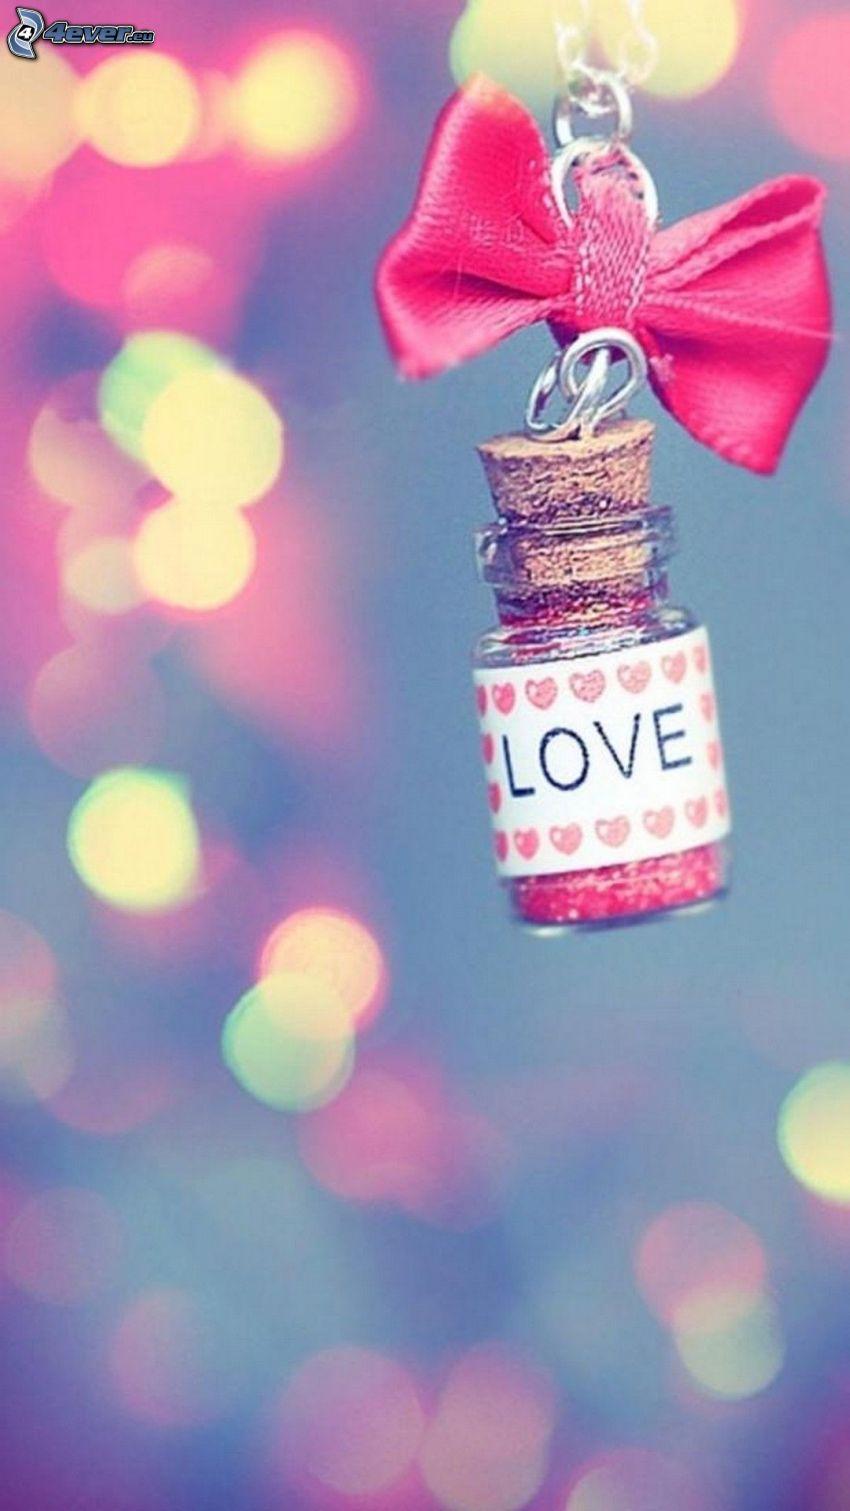 bouteille, love, serre-tęte